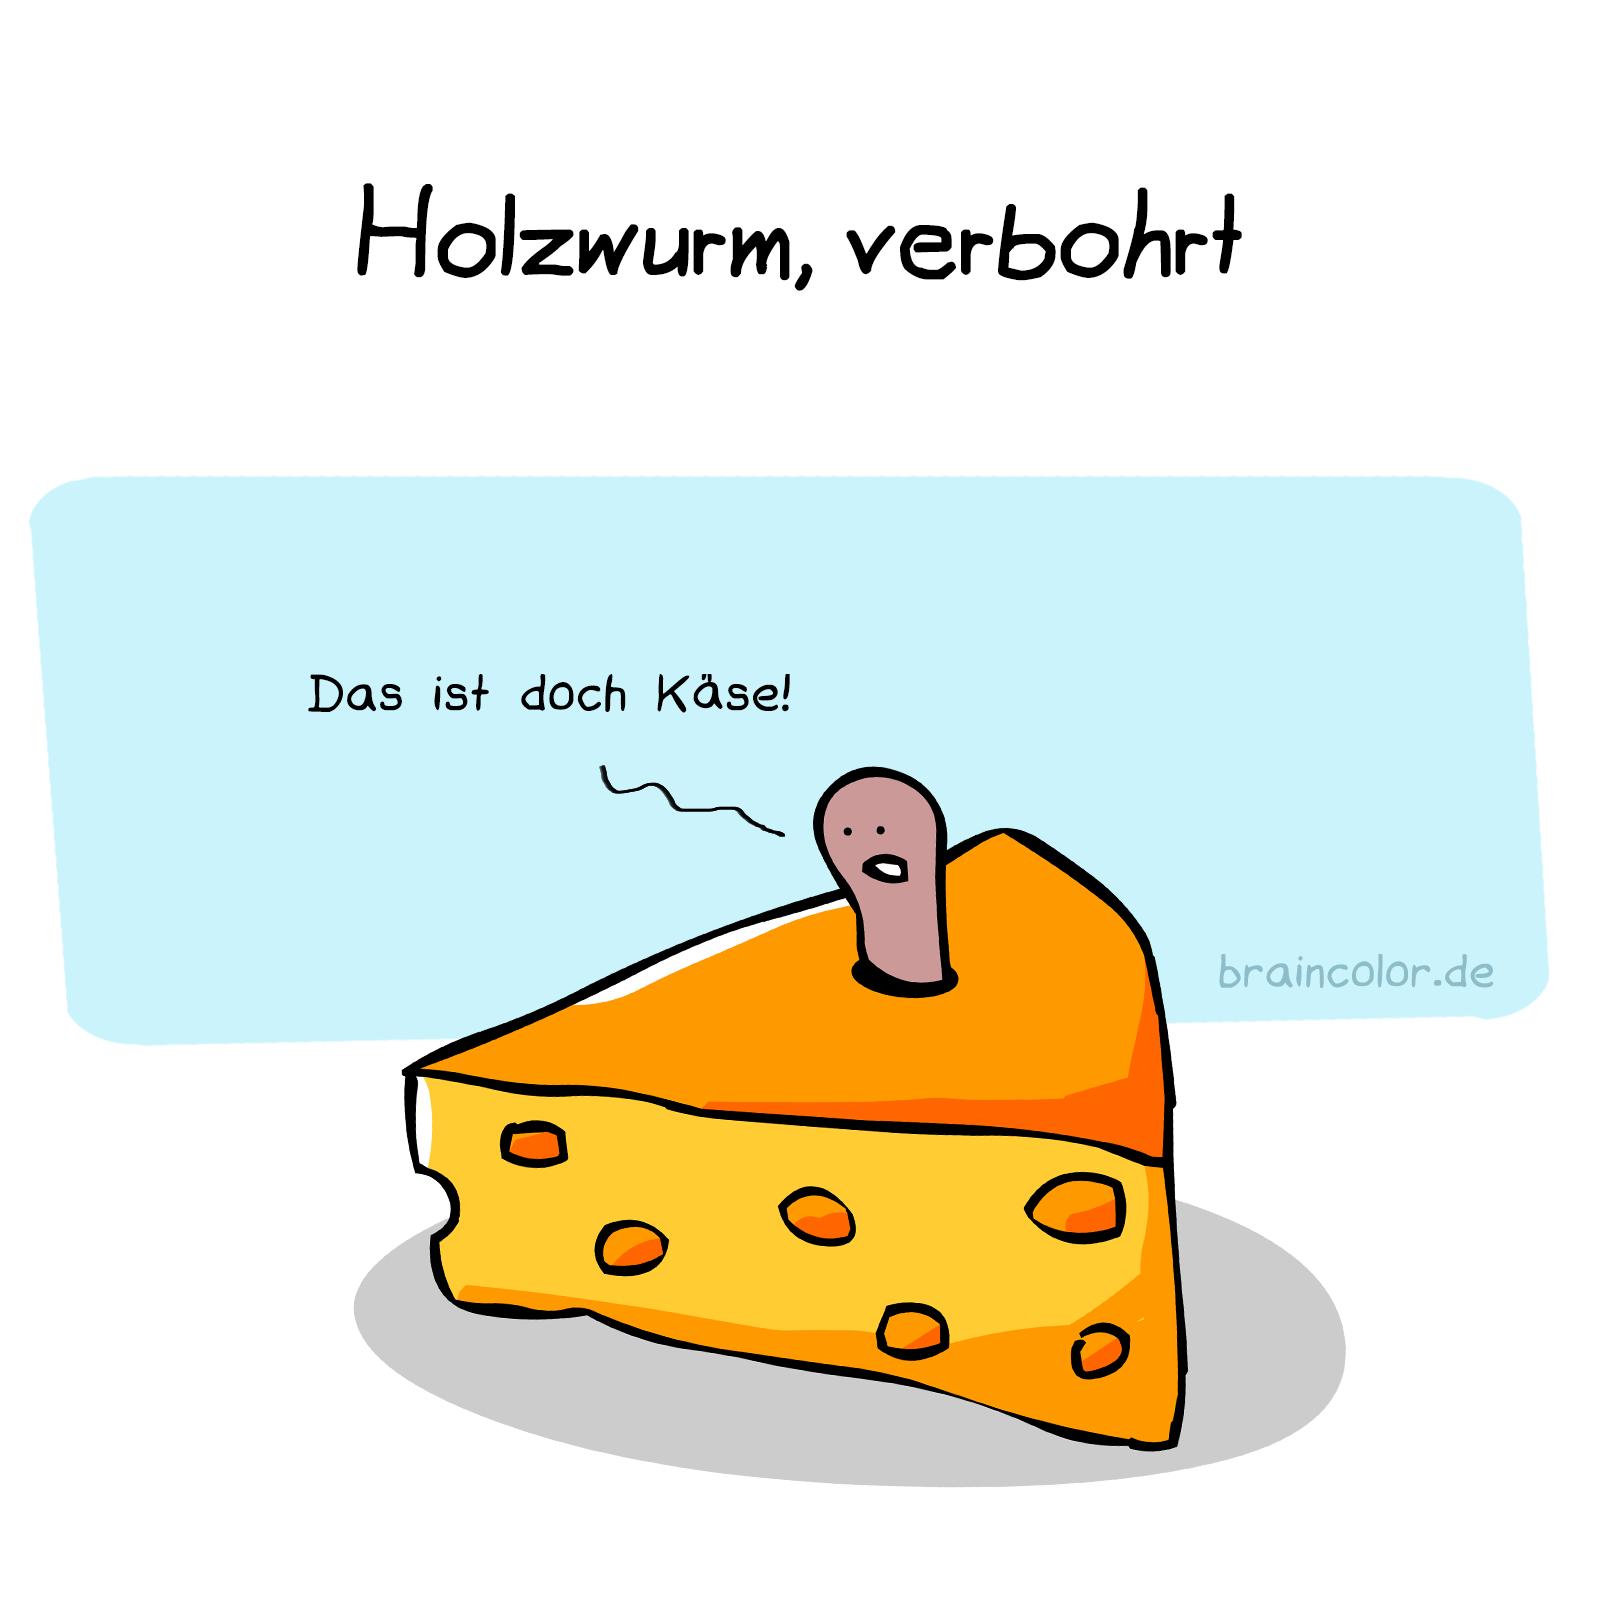 holzwurm-verbohrt